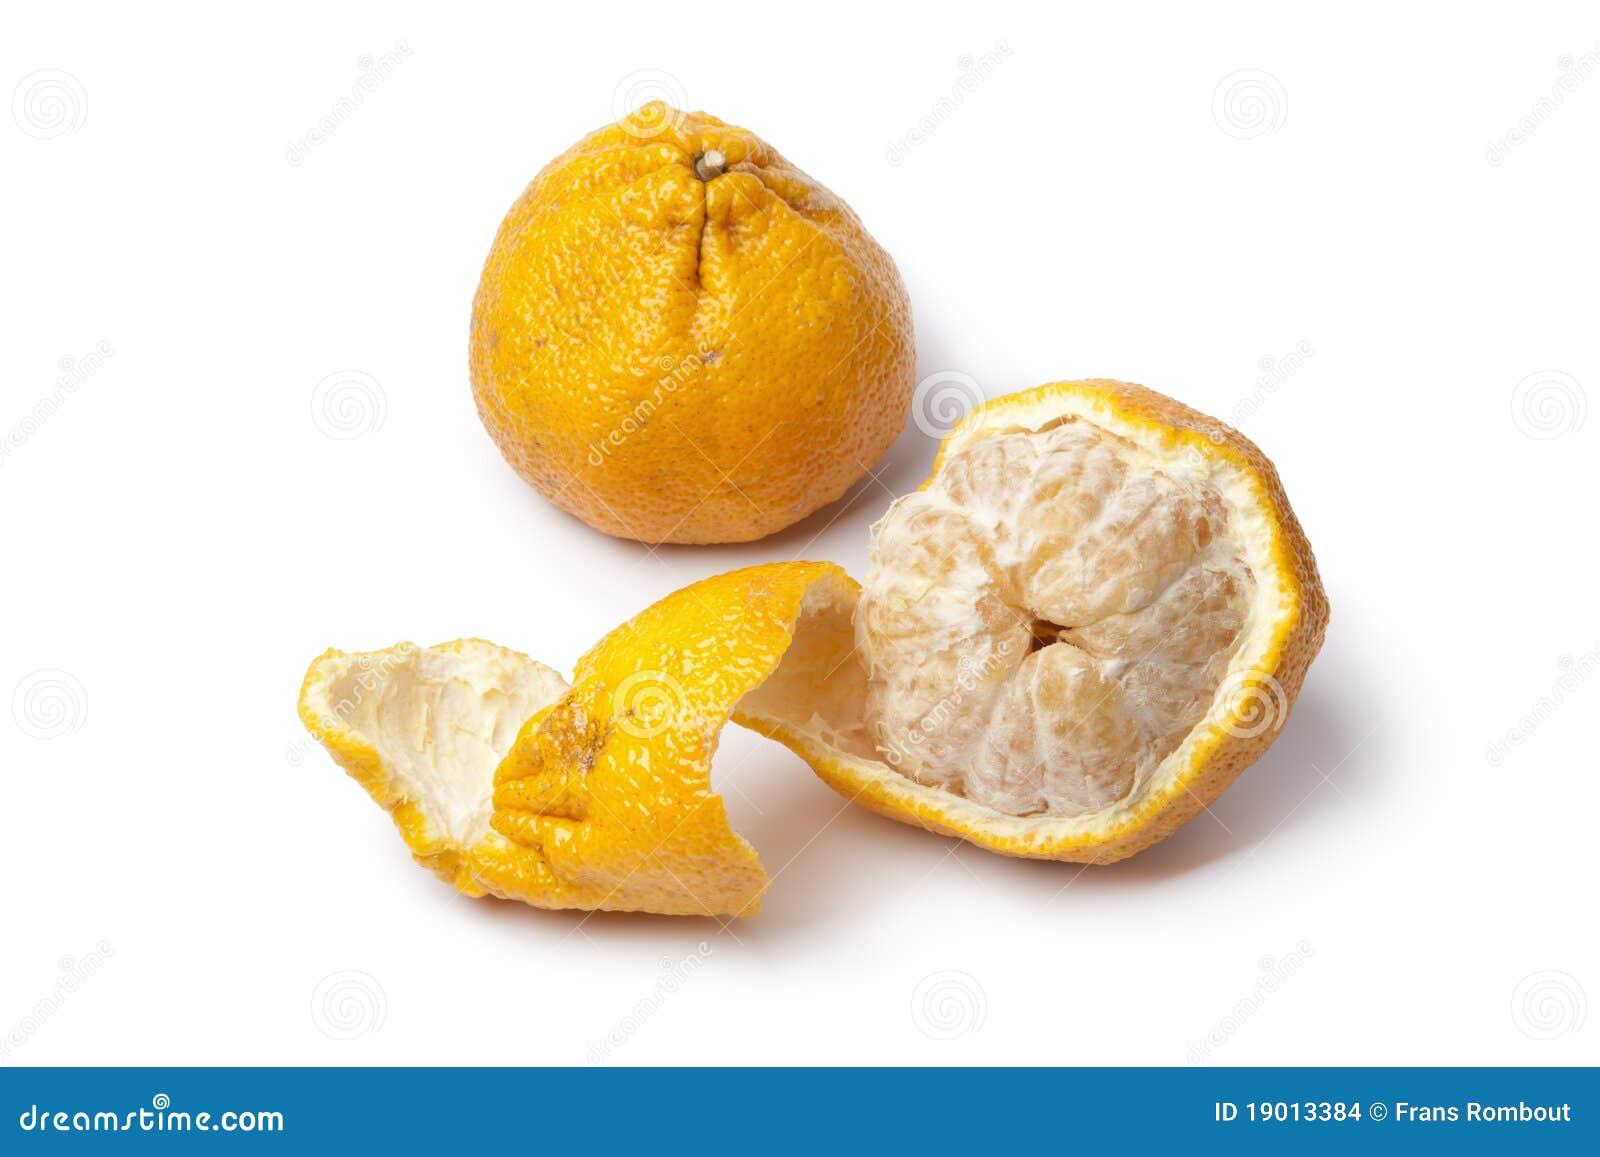 Download Free Png Ugli Fruit (Citrus Ret #2184996 - PNG Images - PNGio